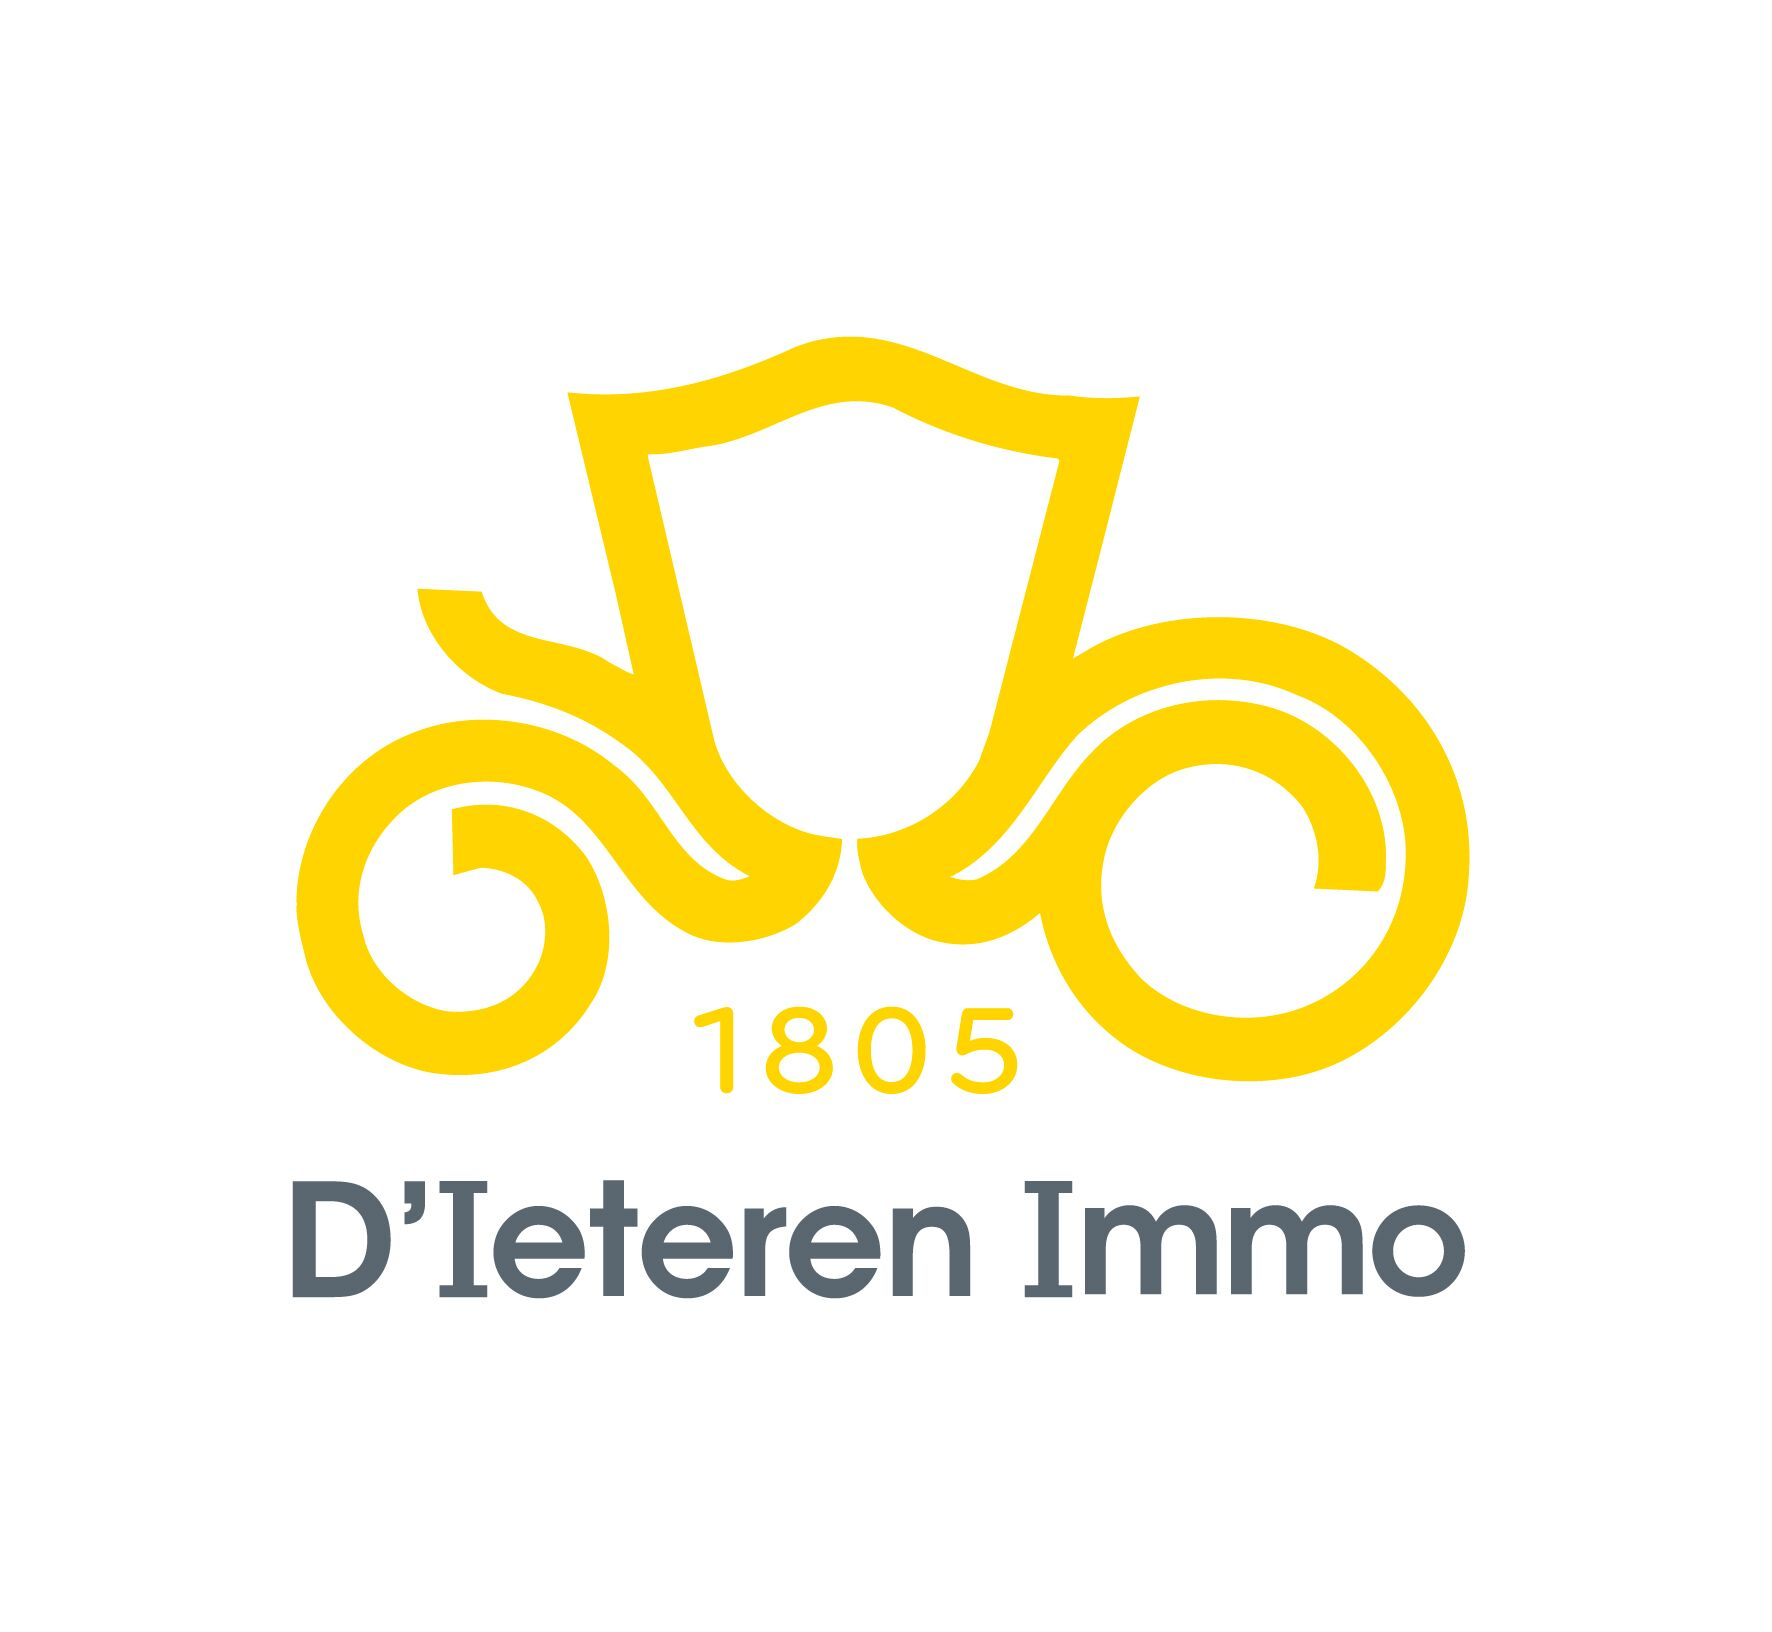 DIeterenImmo logo rgb